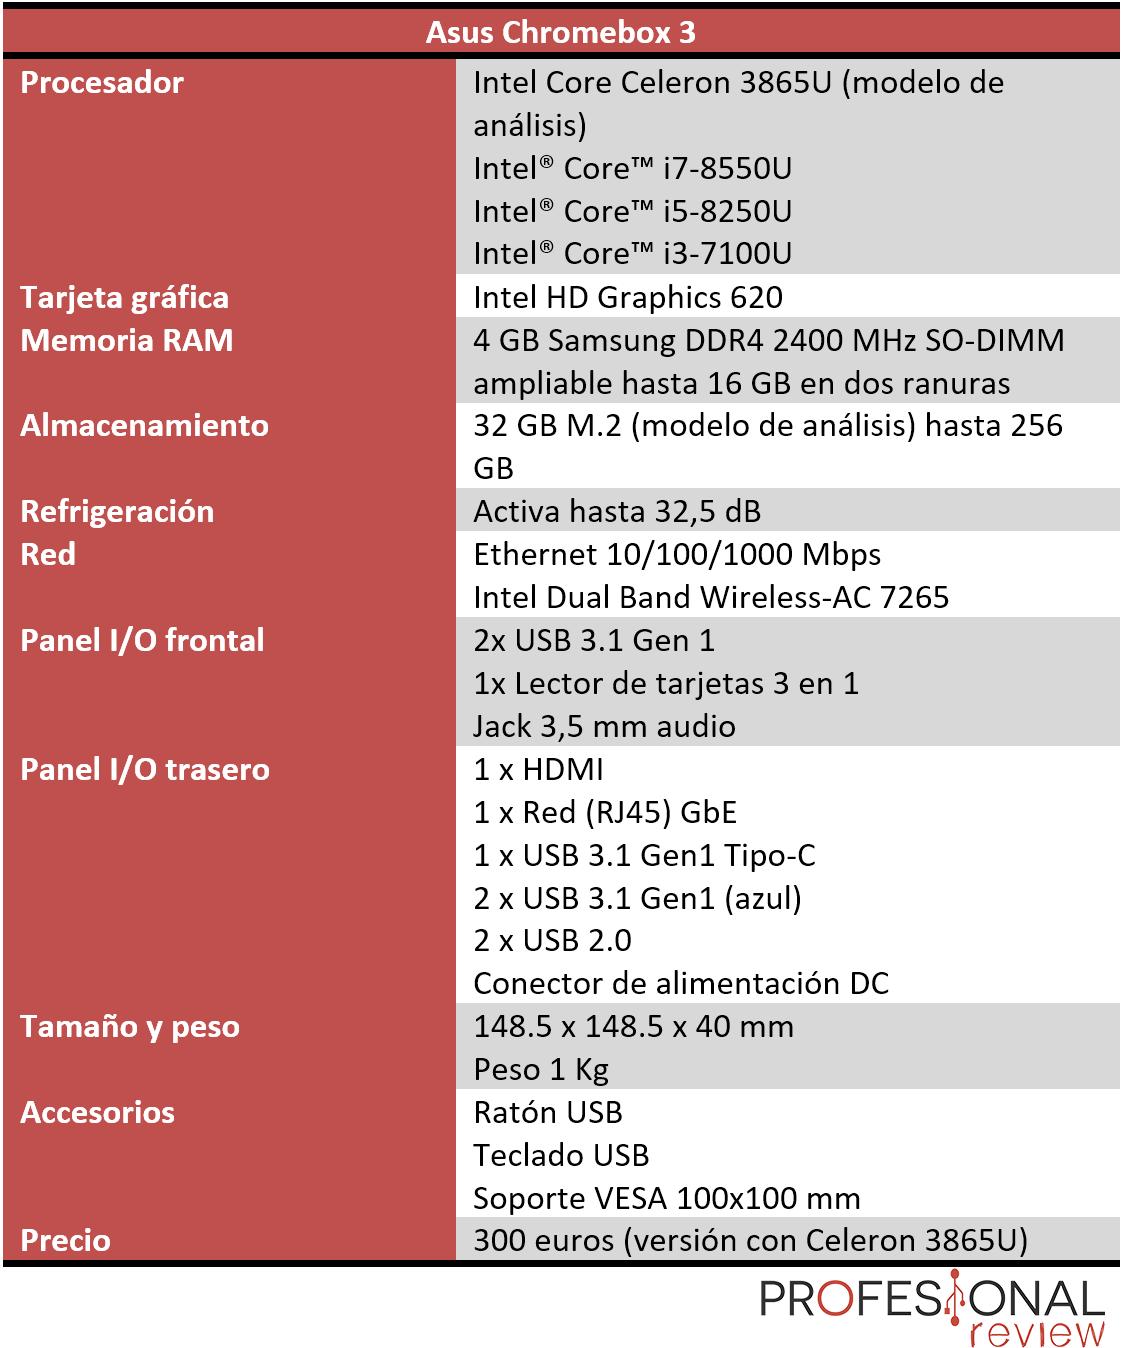 Asus Chromebox 3 características